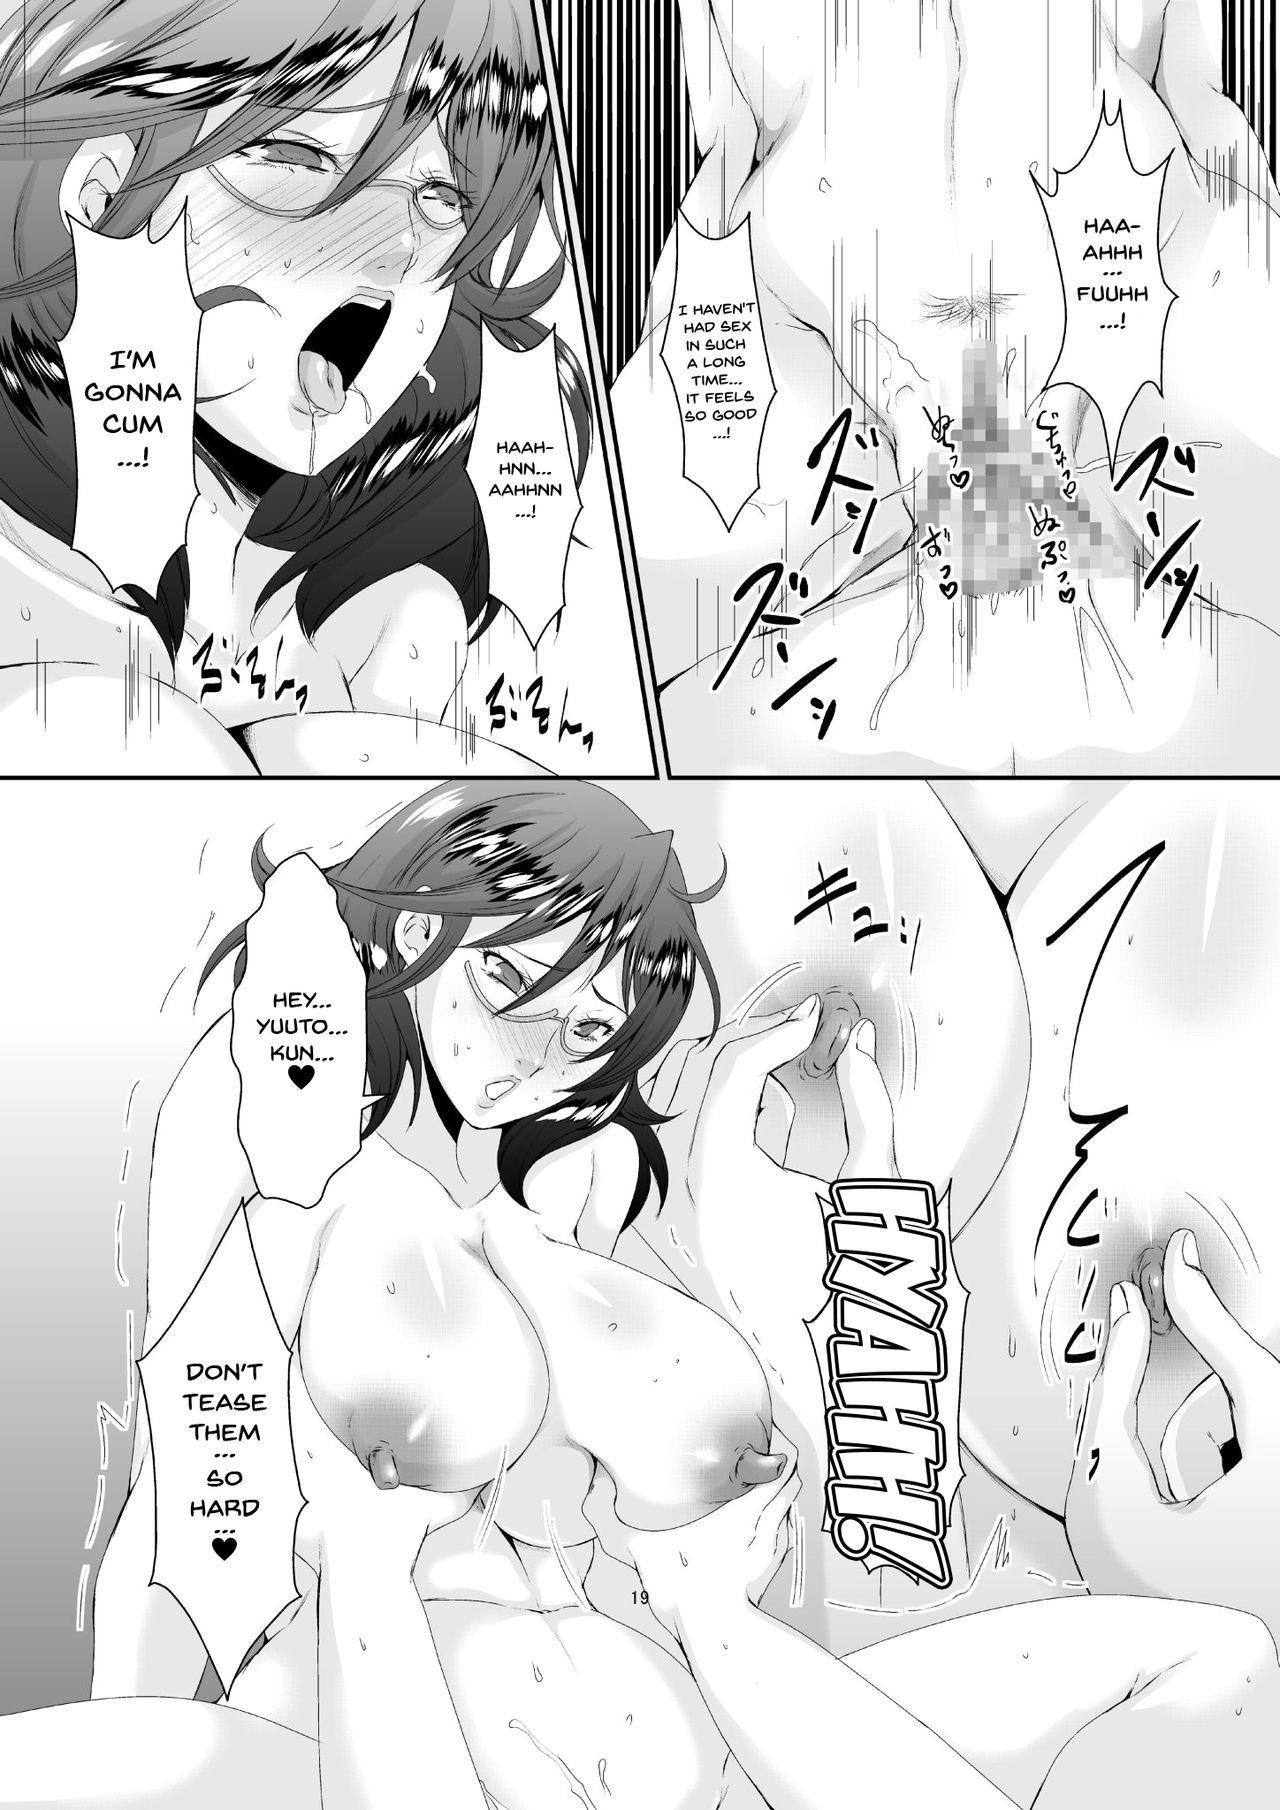 [Sprechchor (Eguchi Chibi)] Oku-sama wa Moto Yariman -Besluted- 2   These Women Were Former Sluts -Besluted- 2 [English] [Doujins.com] [Digital] 19